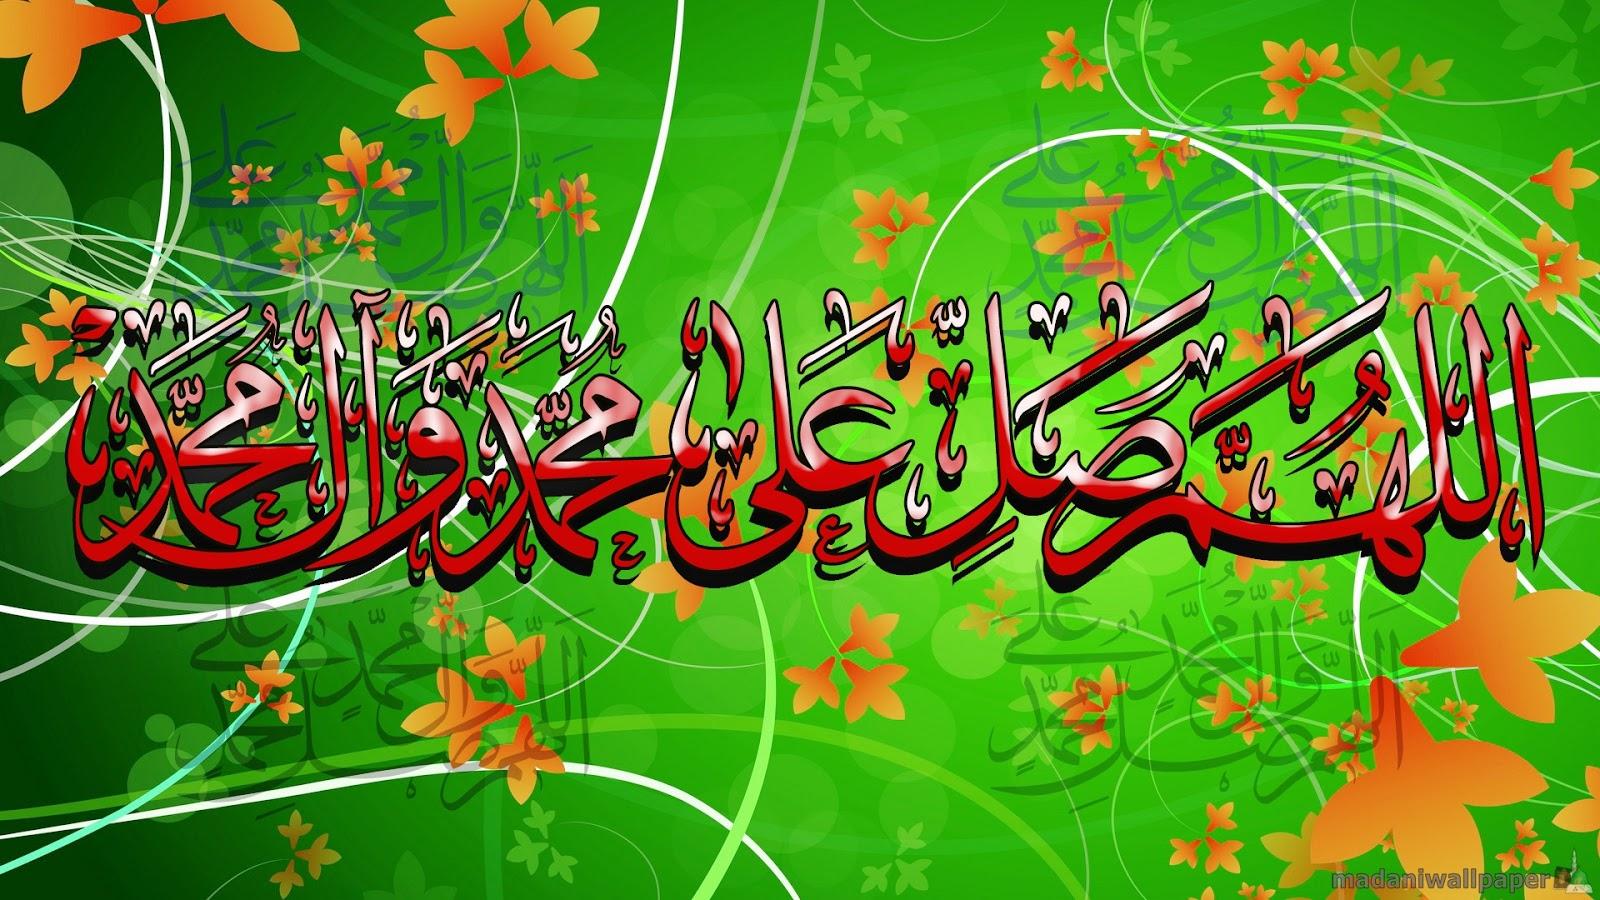 New+Best+hd+Islamic+wallpapers+2013